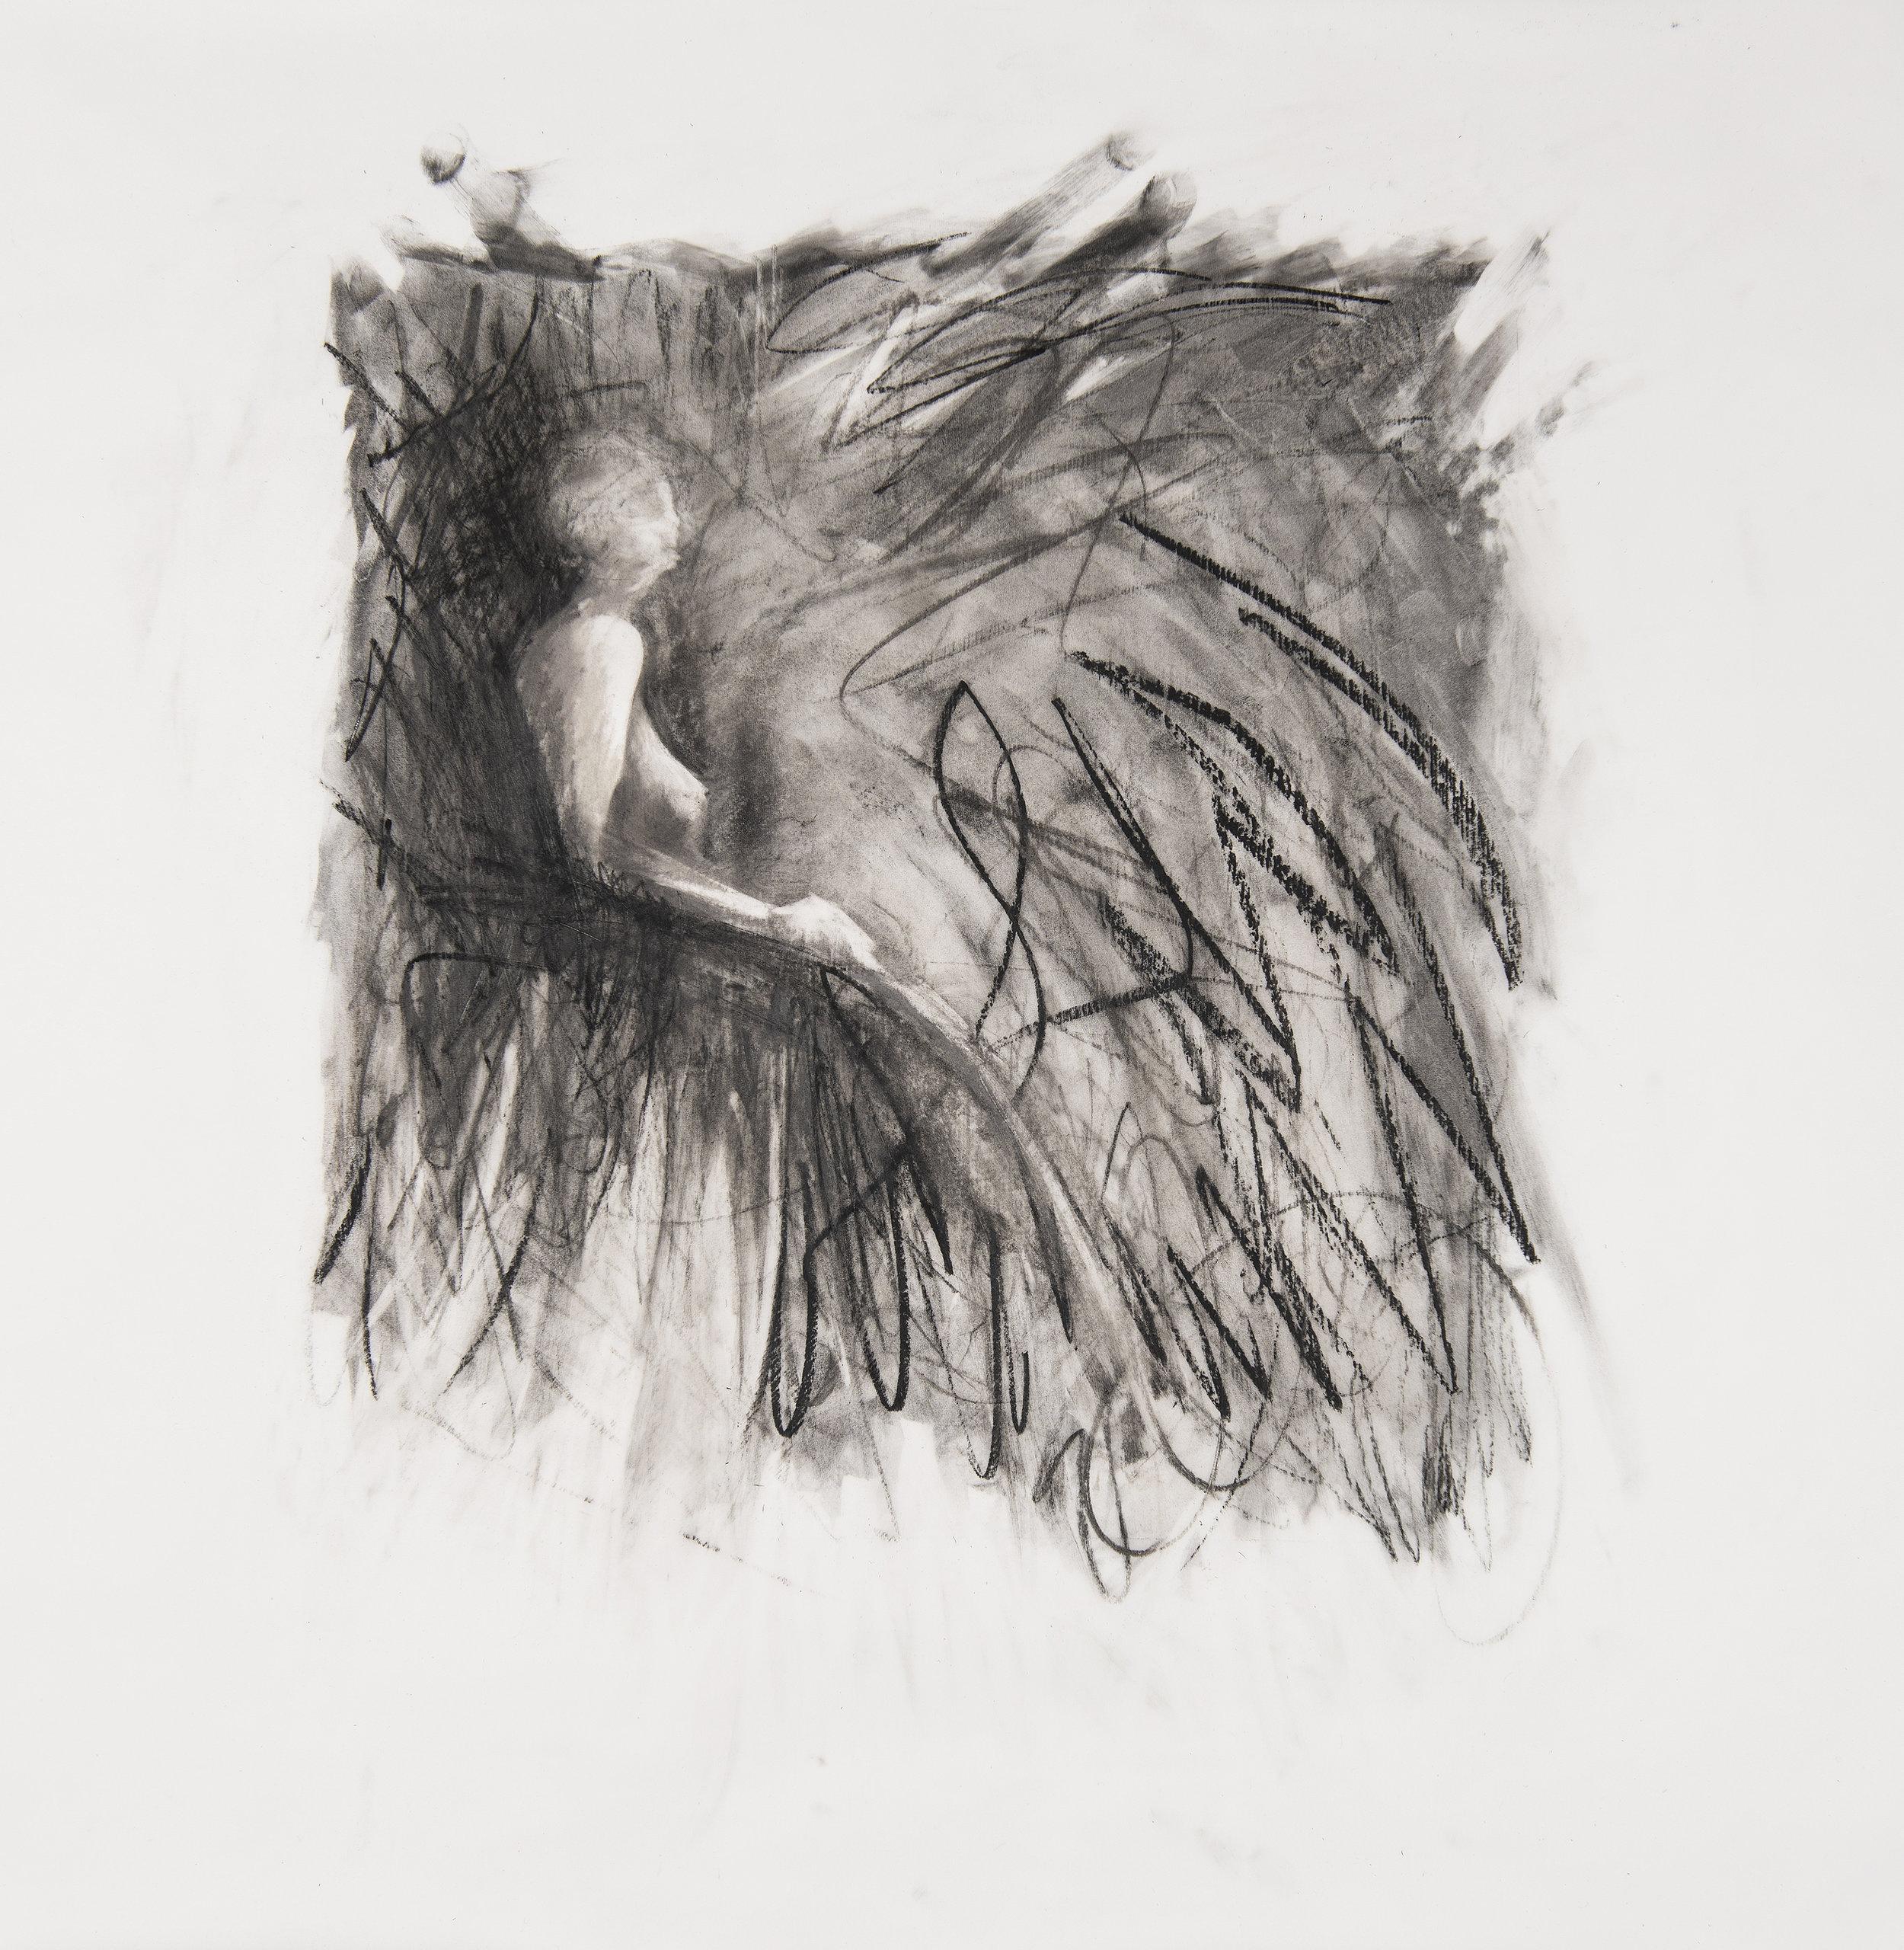 Midpoint drawing study III , 2018 Image credit: Noah da Costa